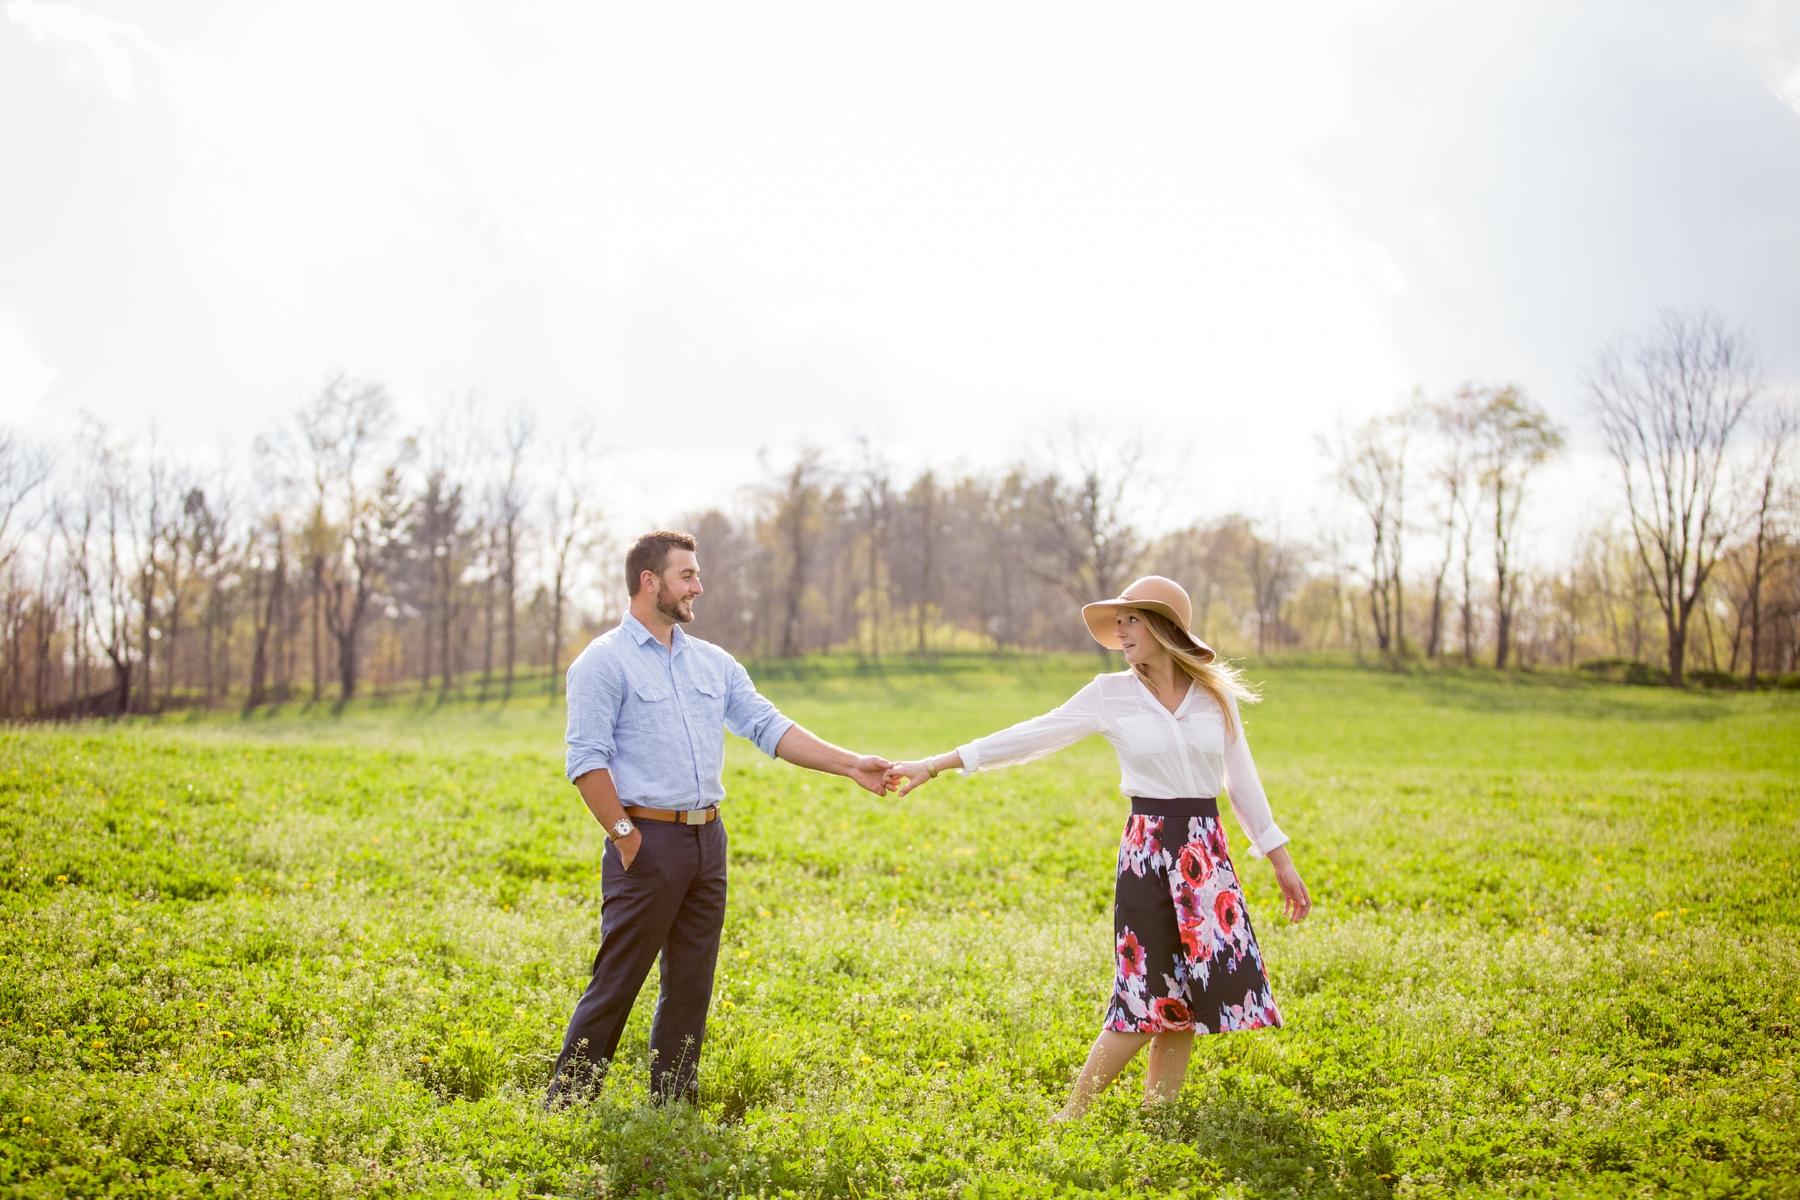 Brandon_Shafer_Photography_Shane_Ashley_Greenhouse_Farm_Michigan_Engagement_0016.jpg